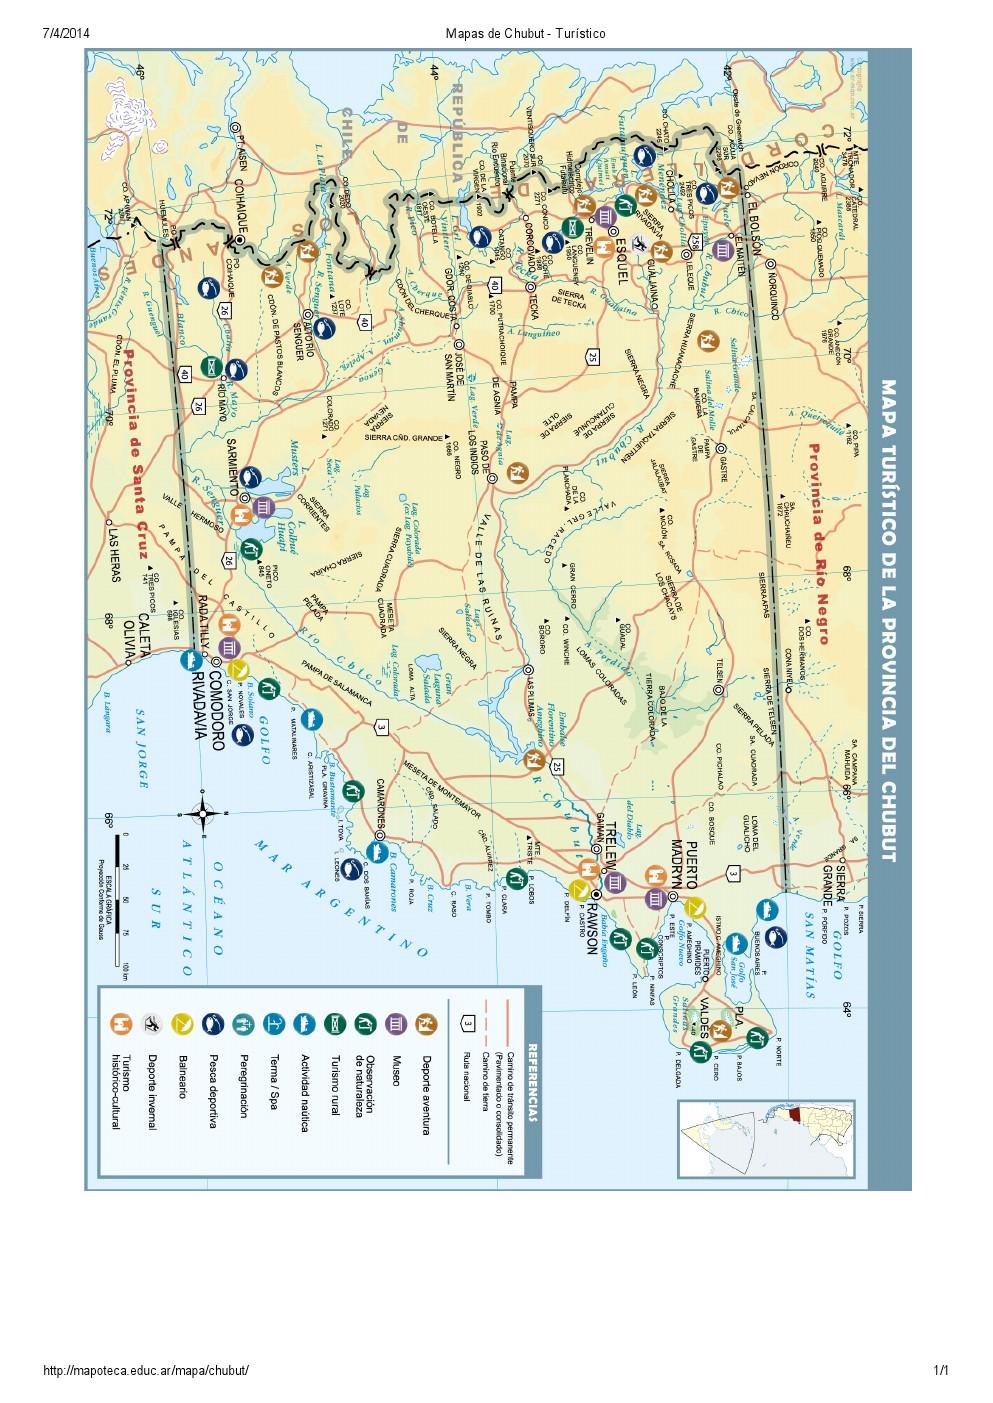 Mapa turístico del Chubut. Mapoteca de Educ.ar